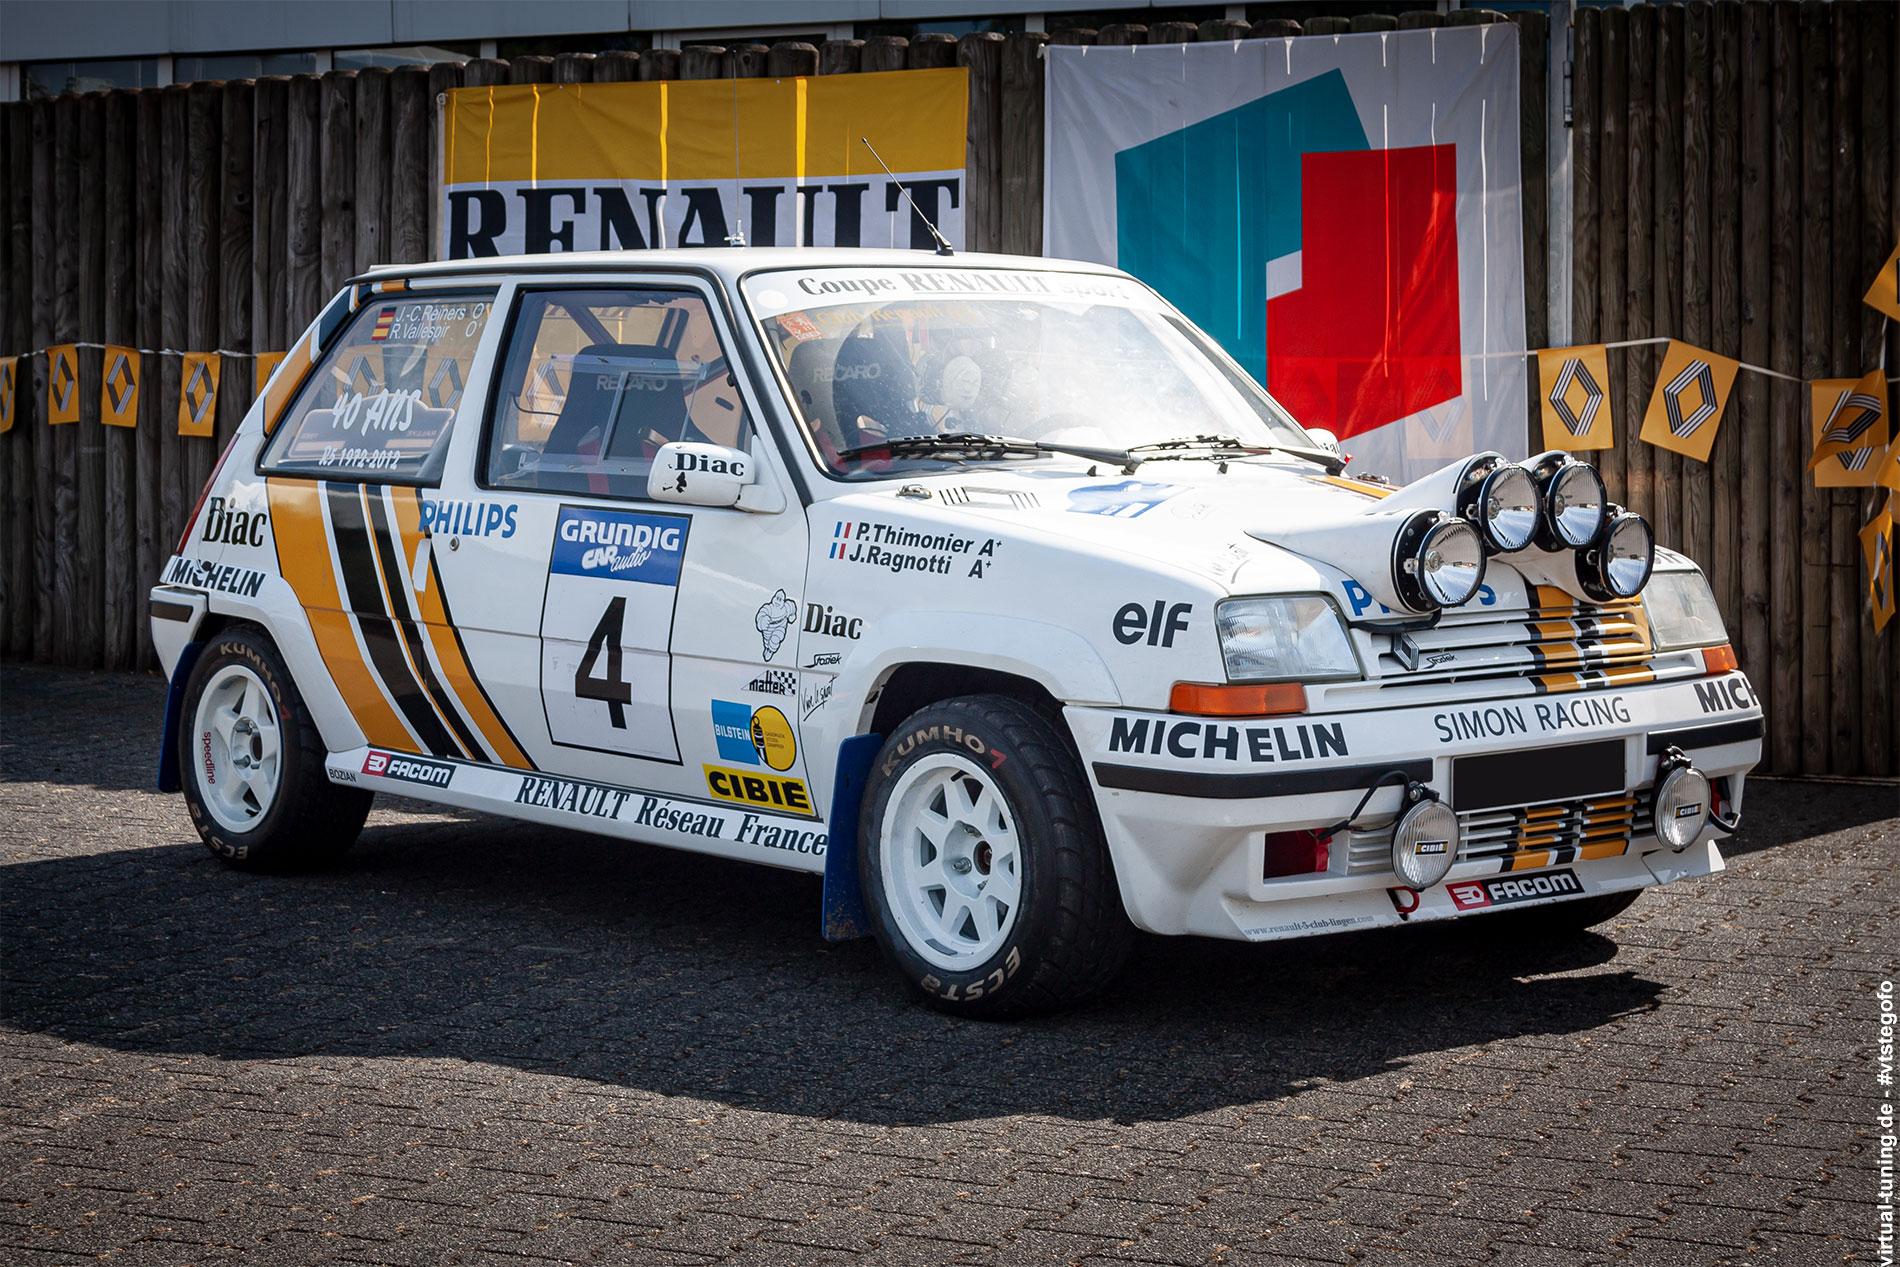 Renault 5 - Renault 5 Treffen in Dülmen (09.2012)